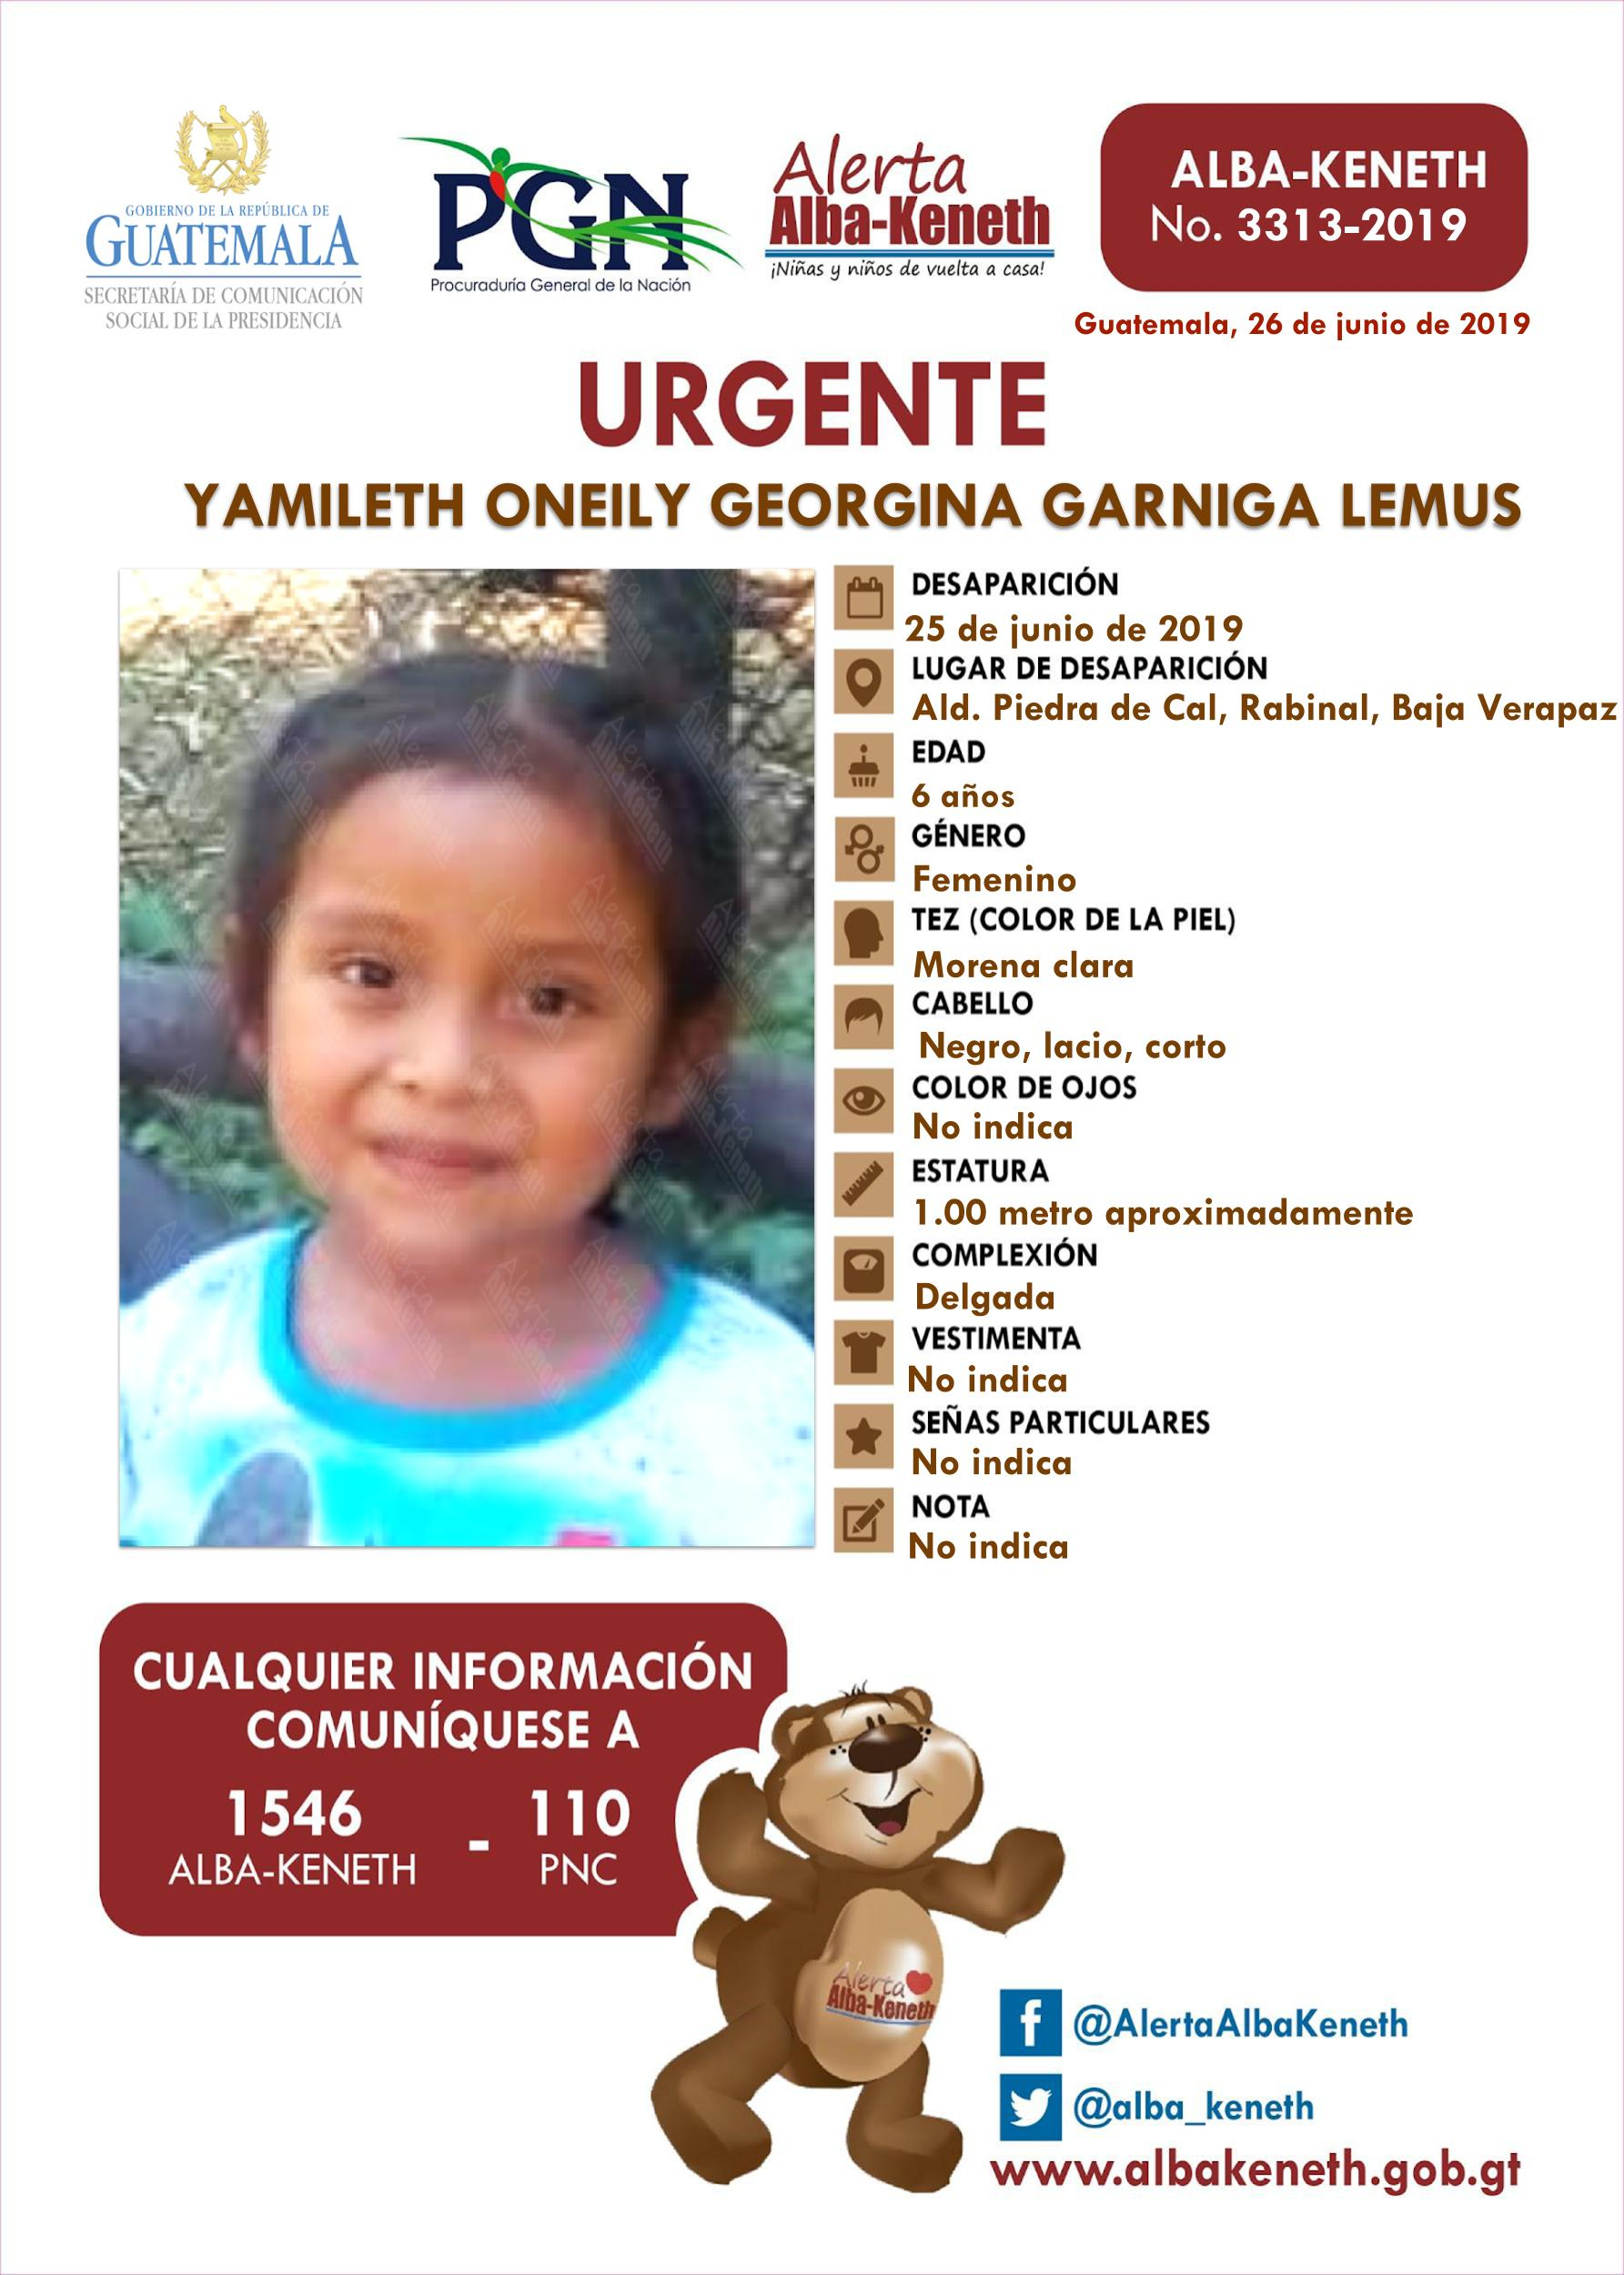 Yamileth Oneily Georgina Garniga Lemus